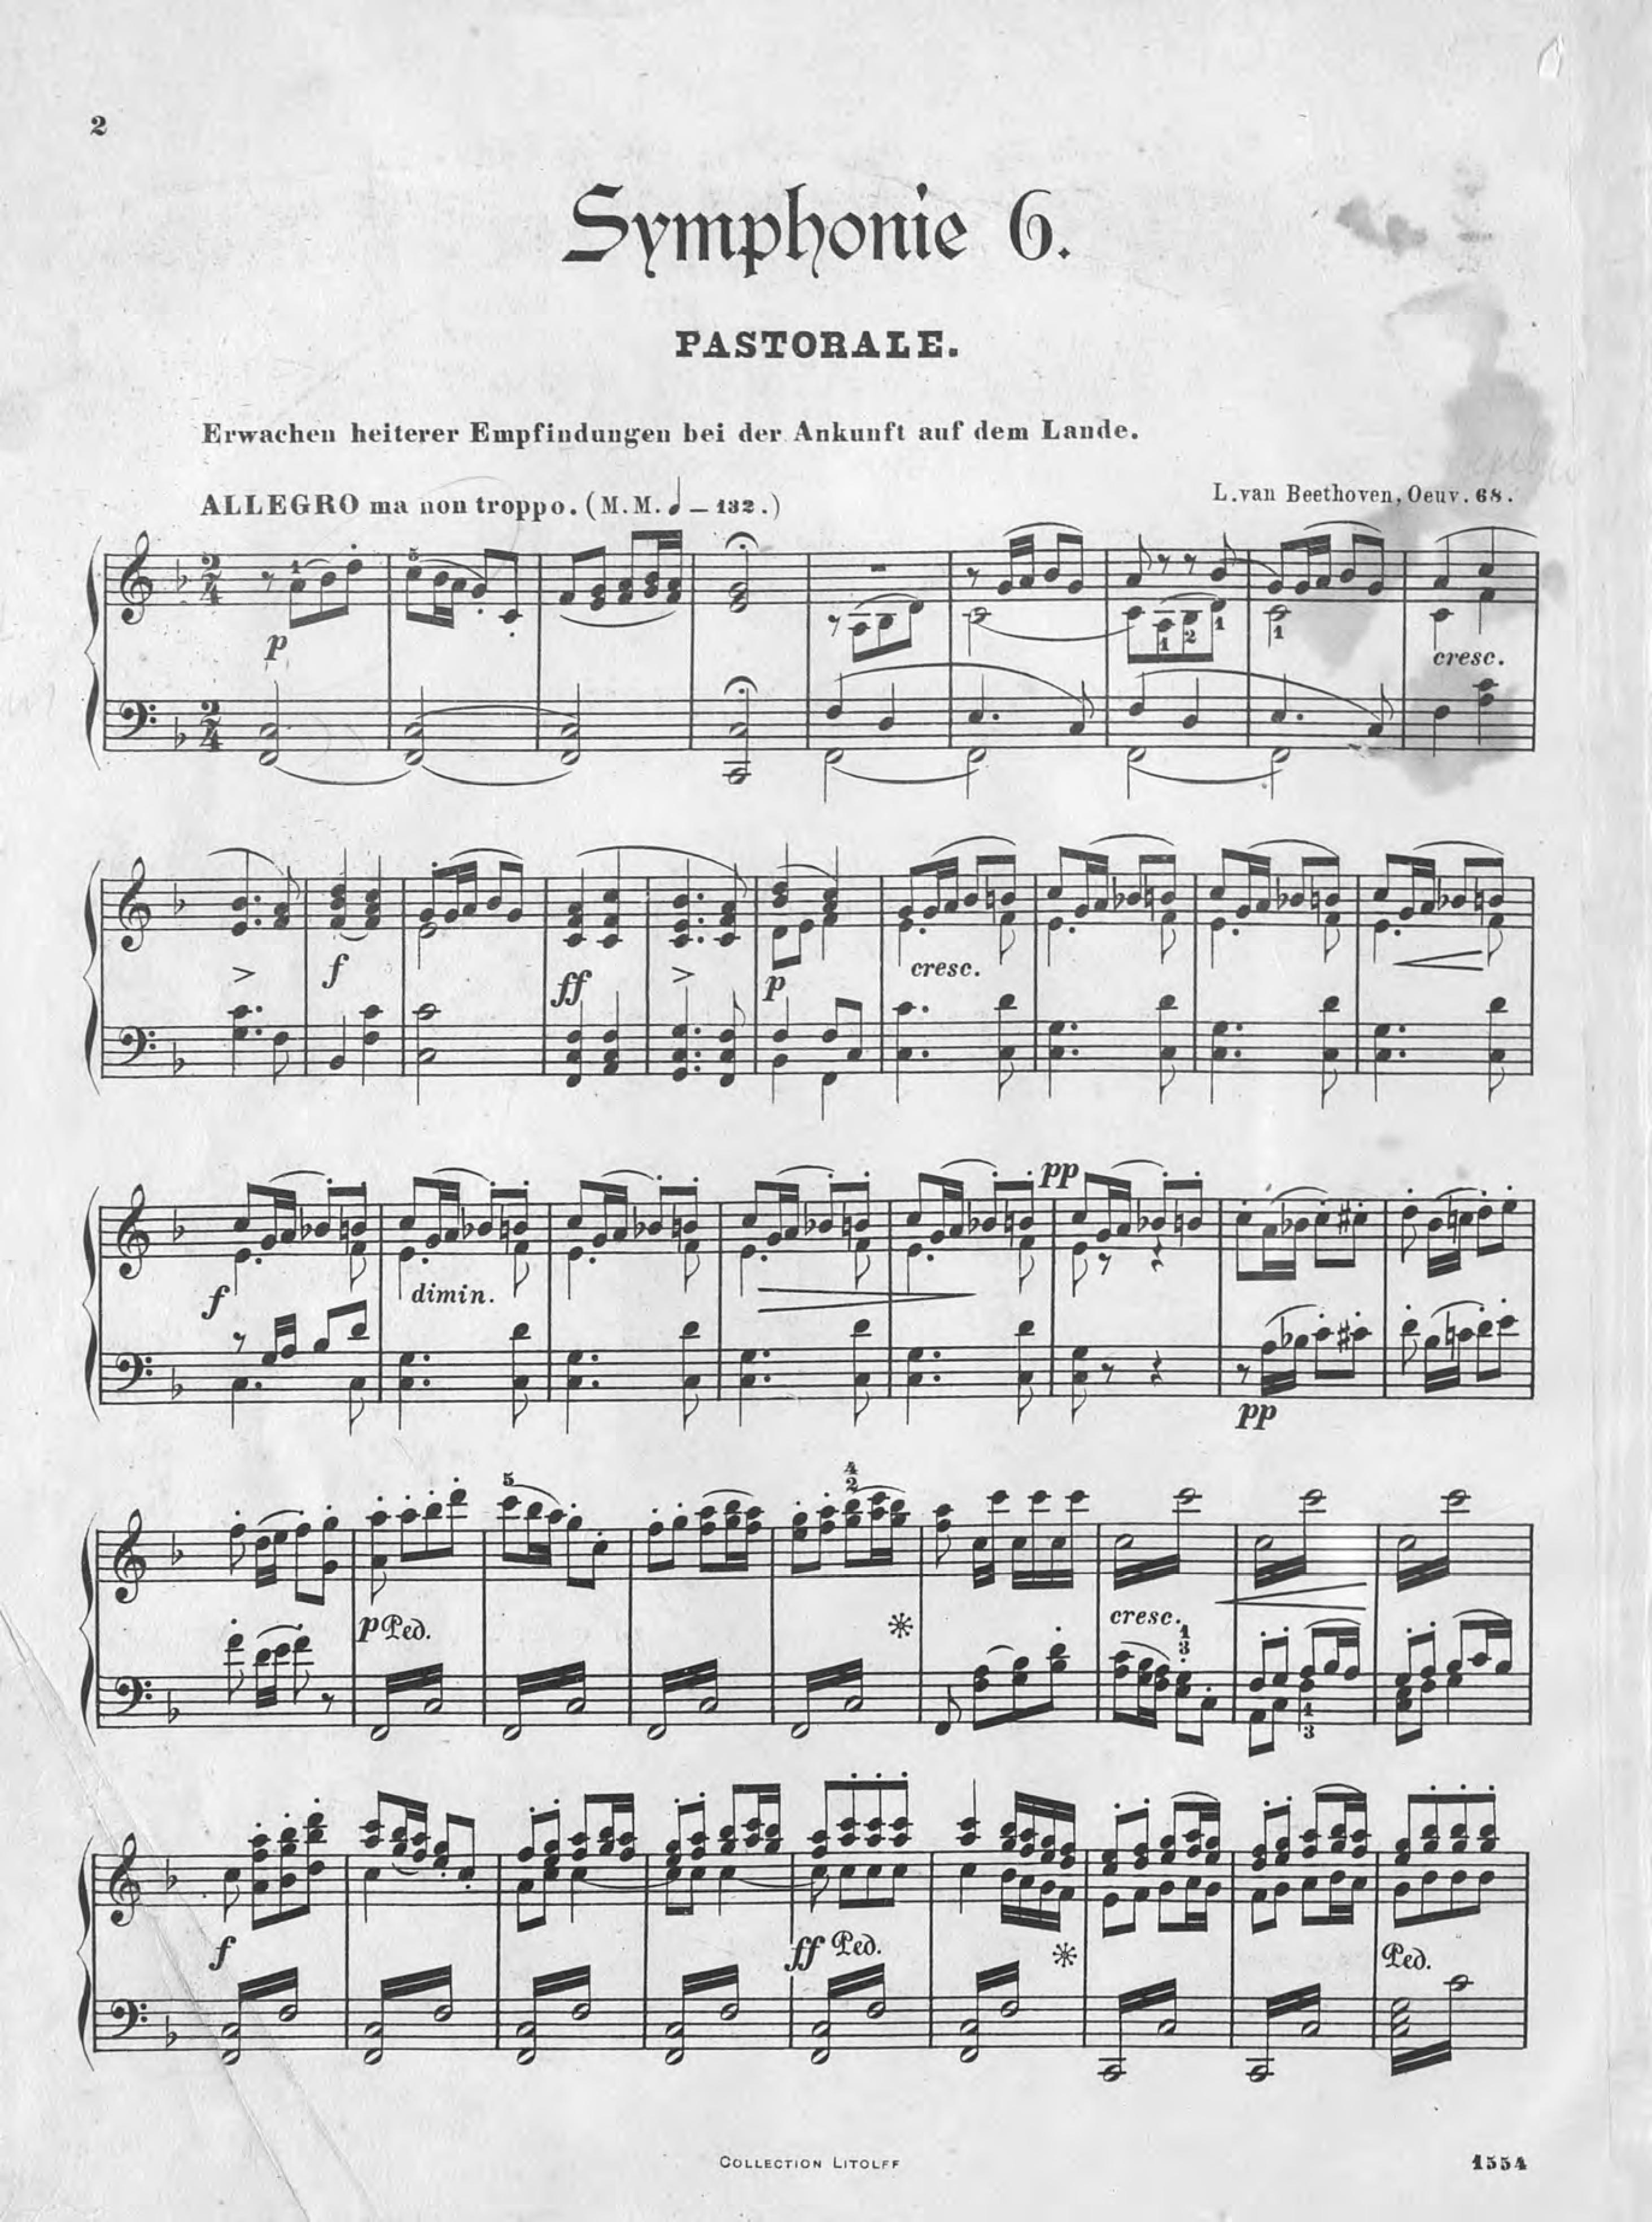 Людвиг ван Бетховен Symphonie № 6 (Pastoral) F-Dur густав малер erste symphonie in d dur